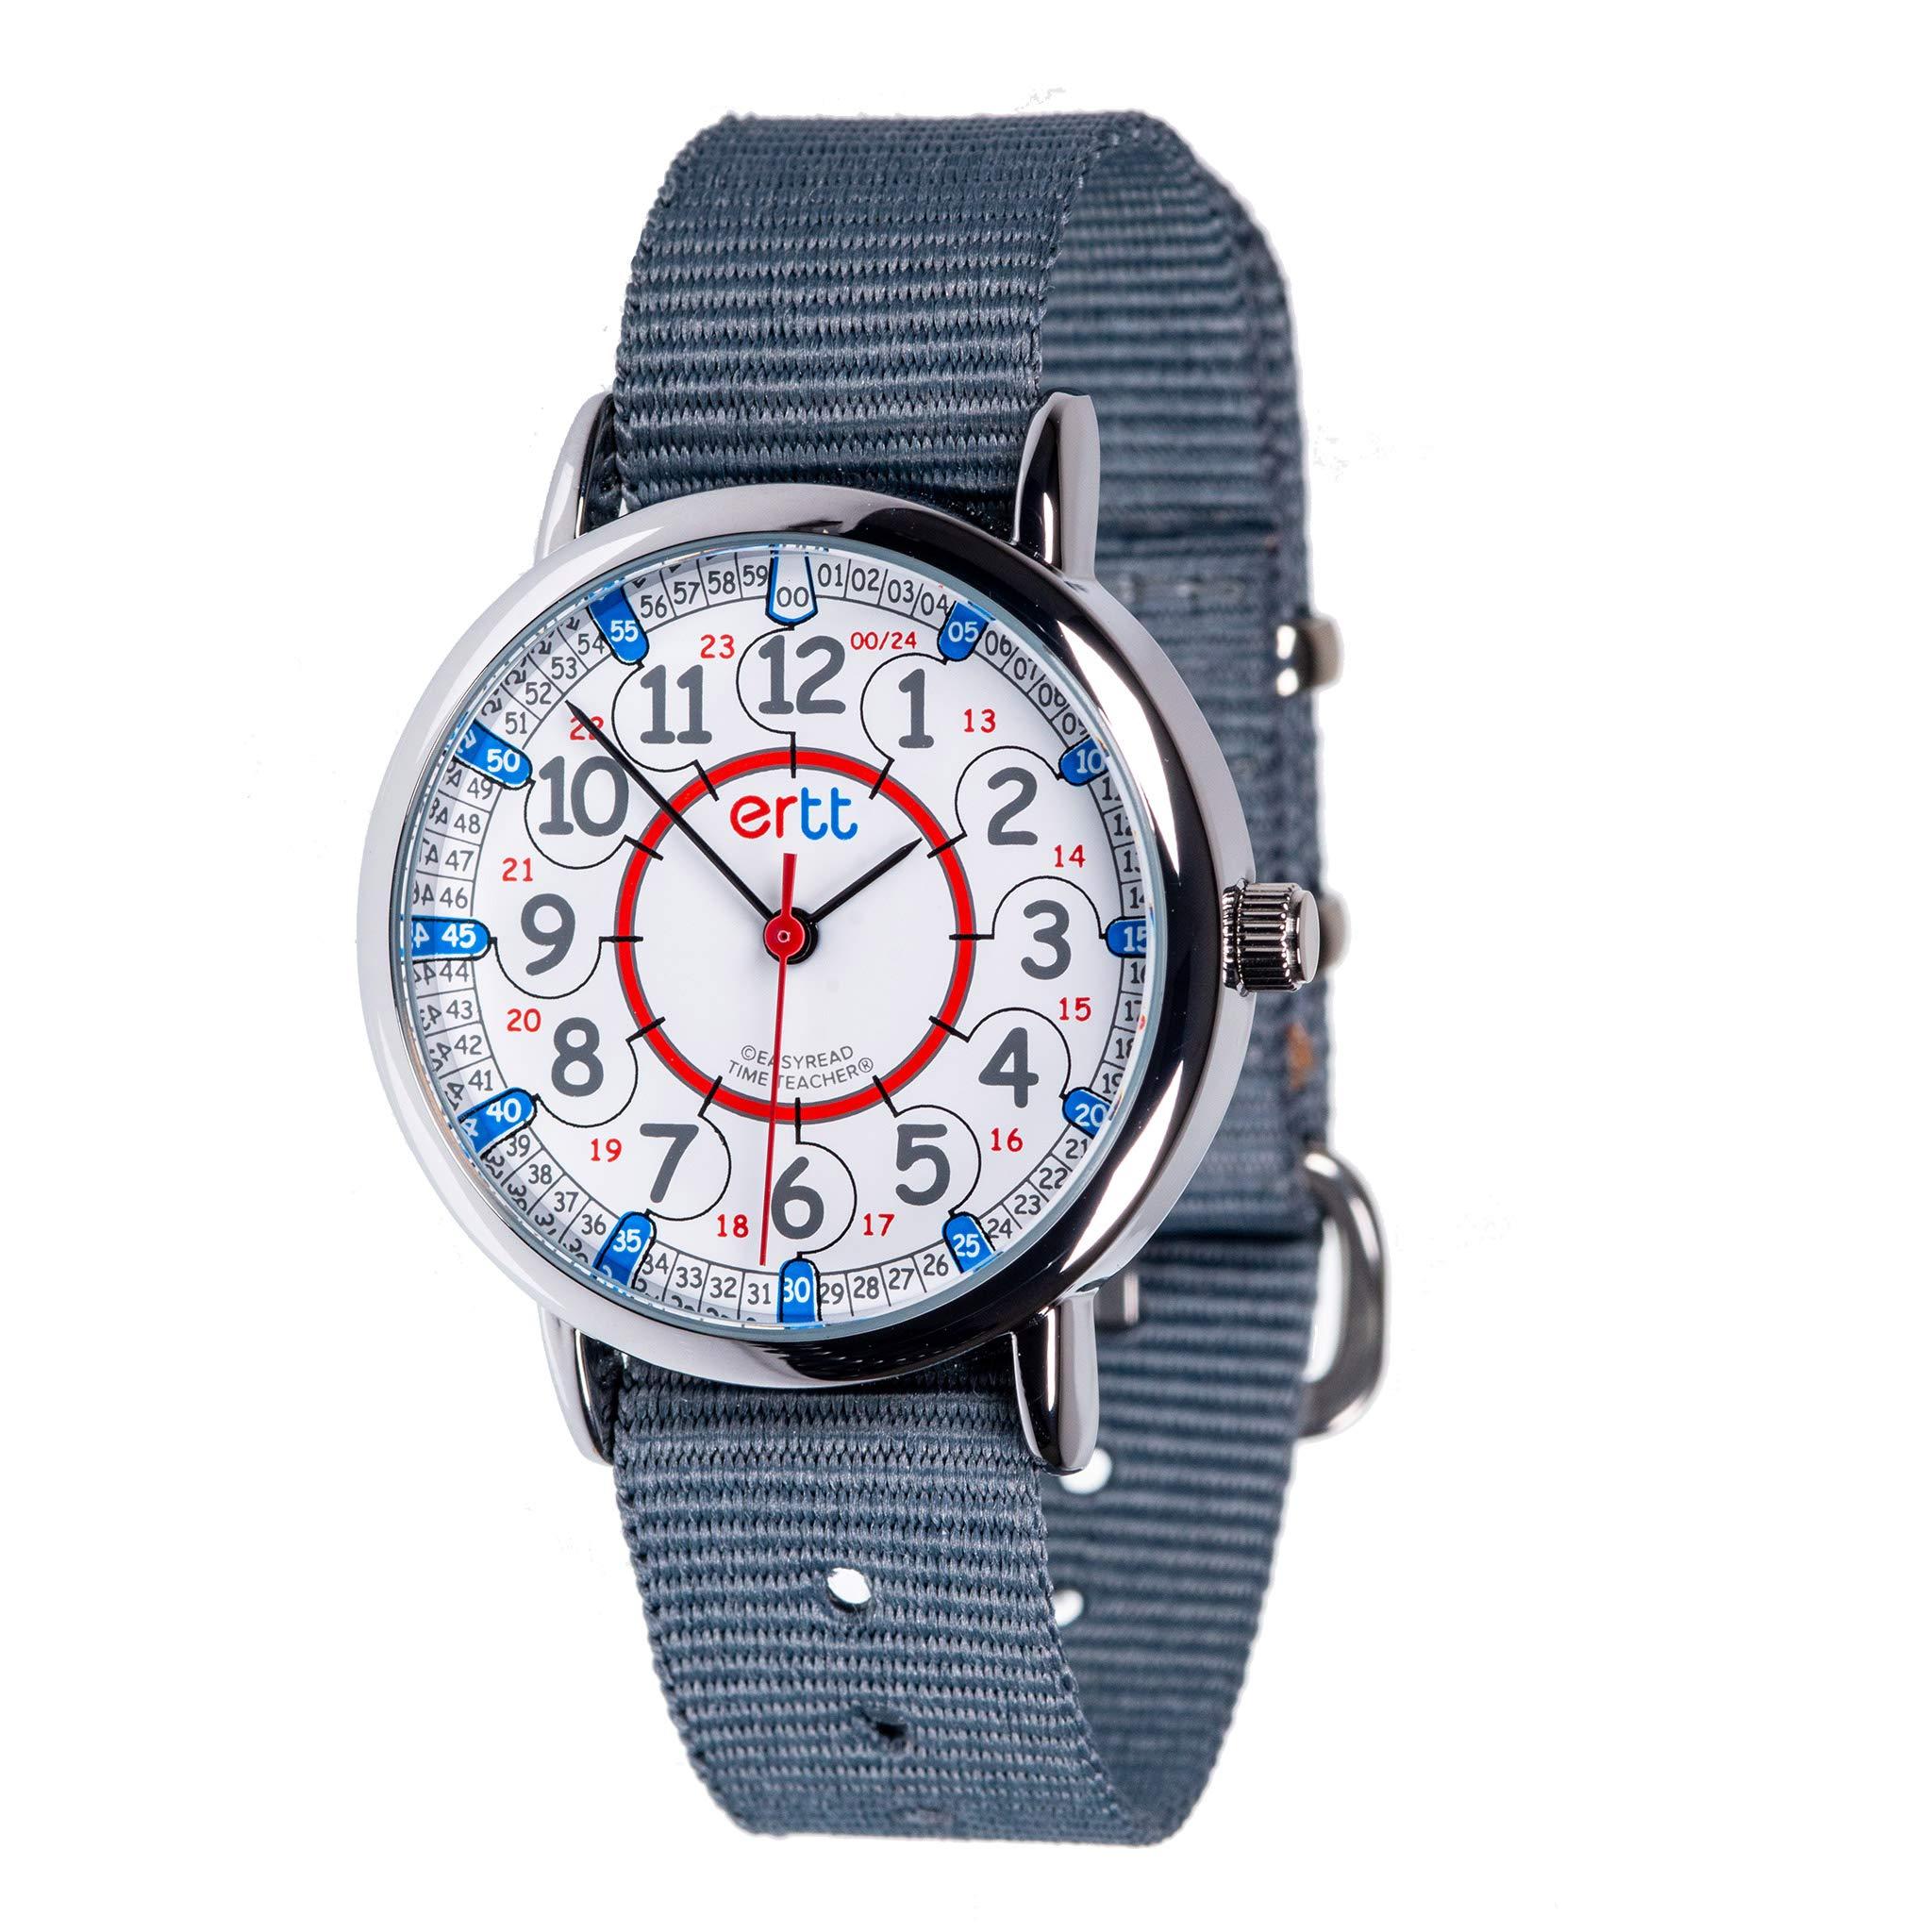 EasyRead Time Teacher Children's Watch, Red Blue 12/24 Hour Face, Grey Strap by EasyRead Time Teacher (Image #1)